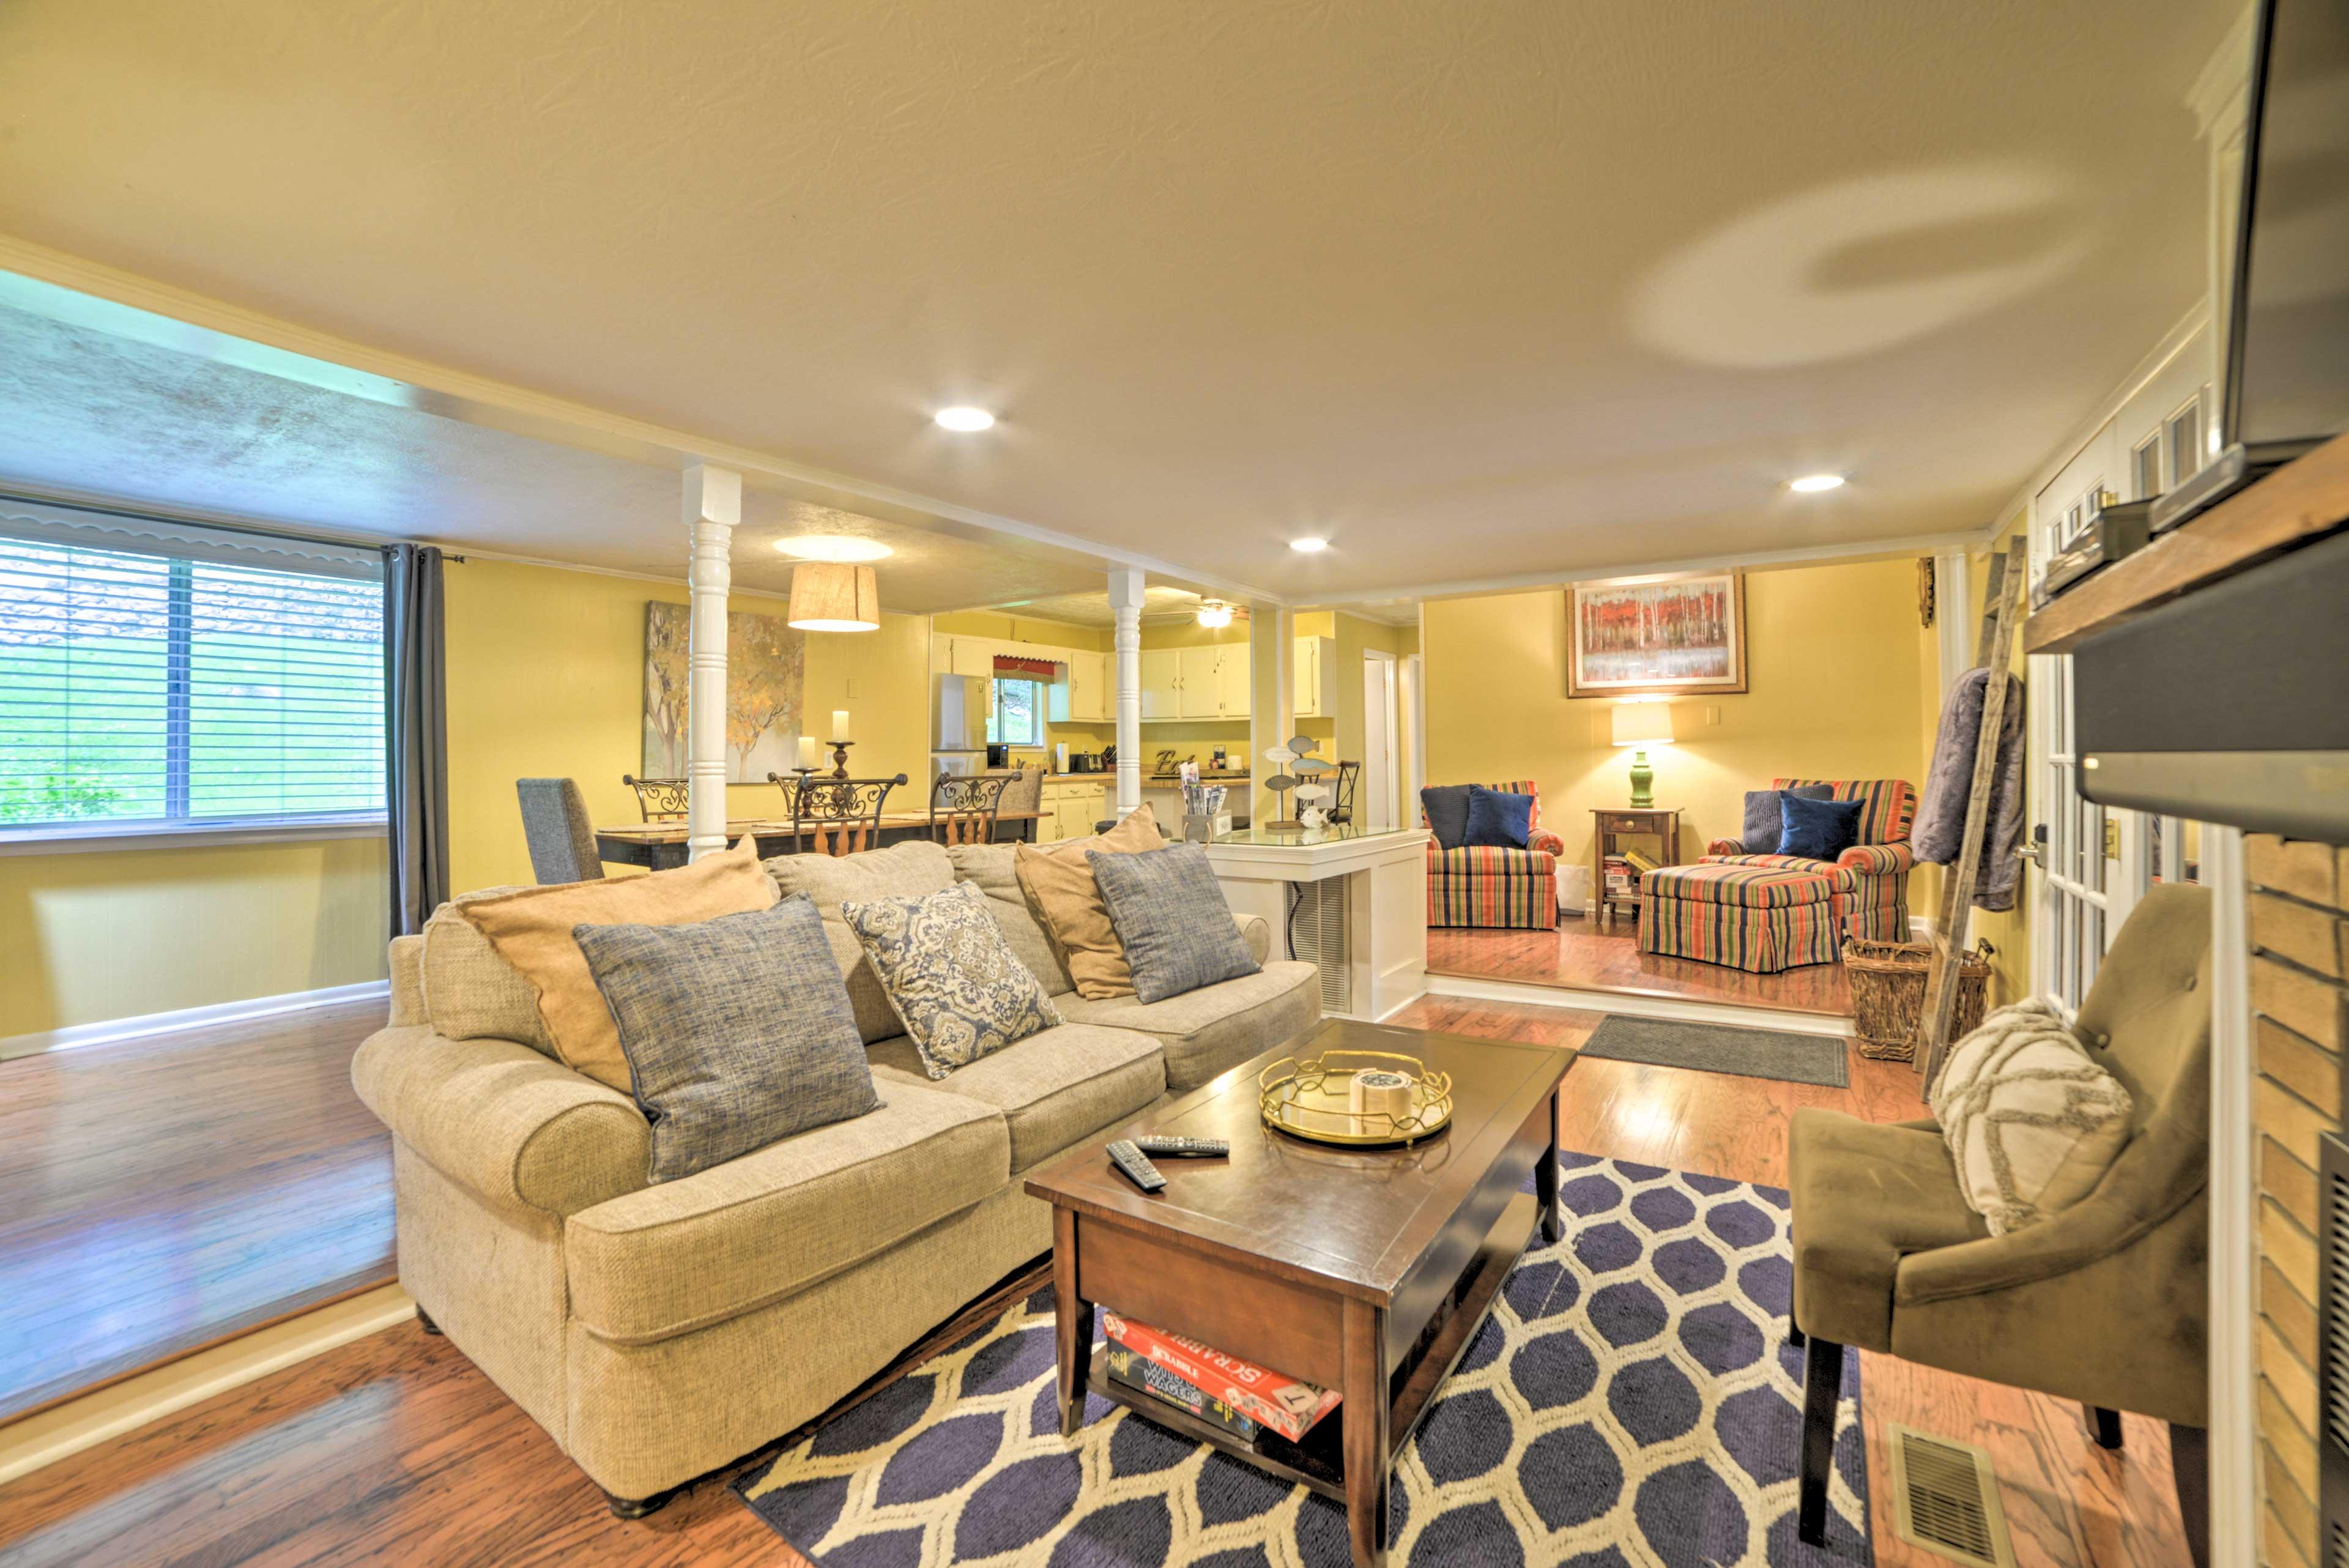 Living Room | 1,500 Sq Ft